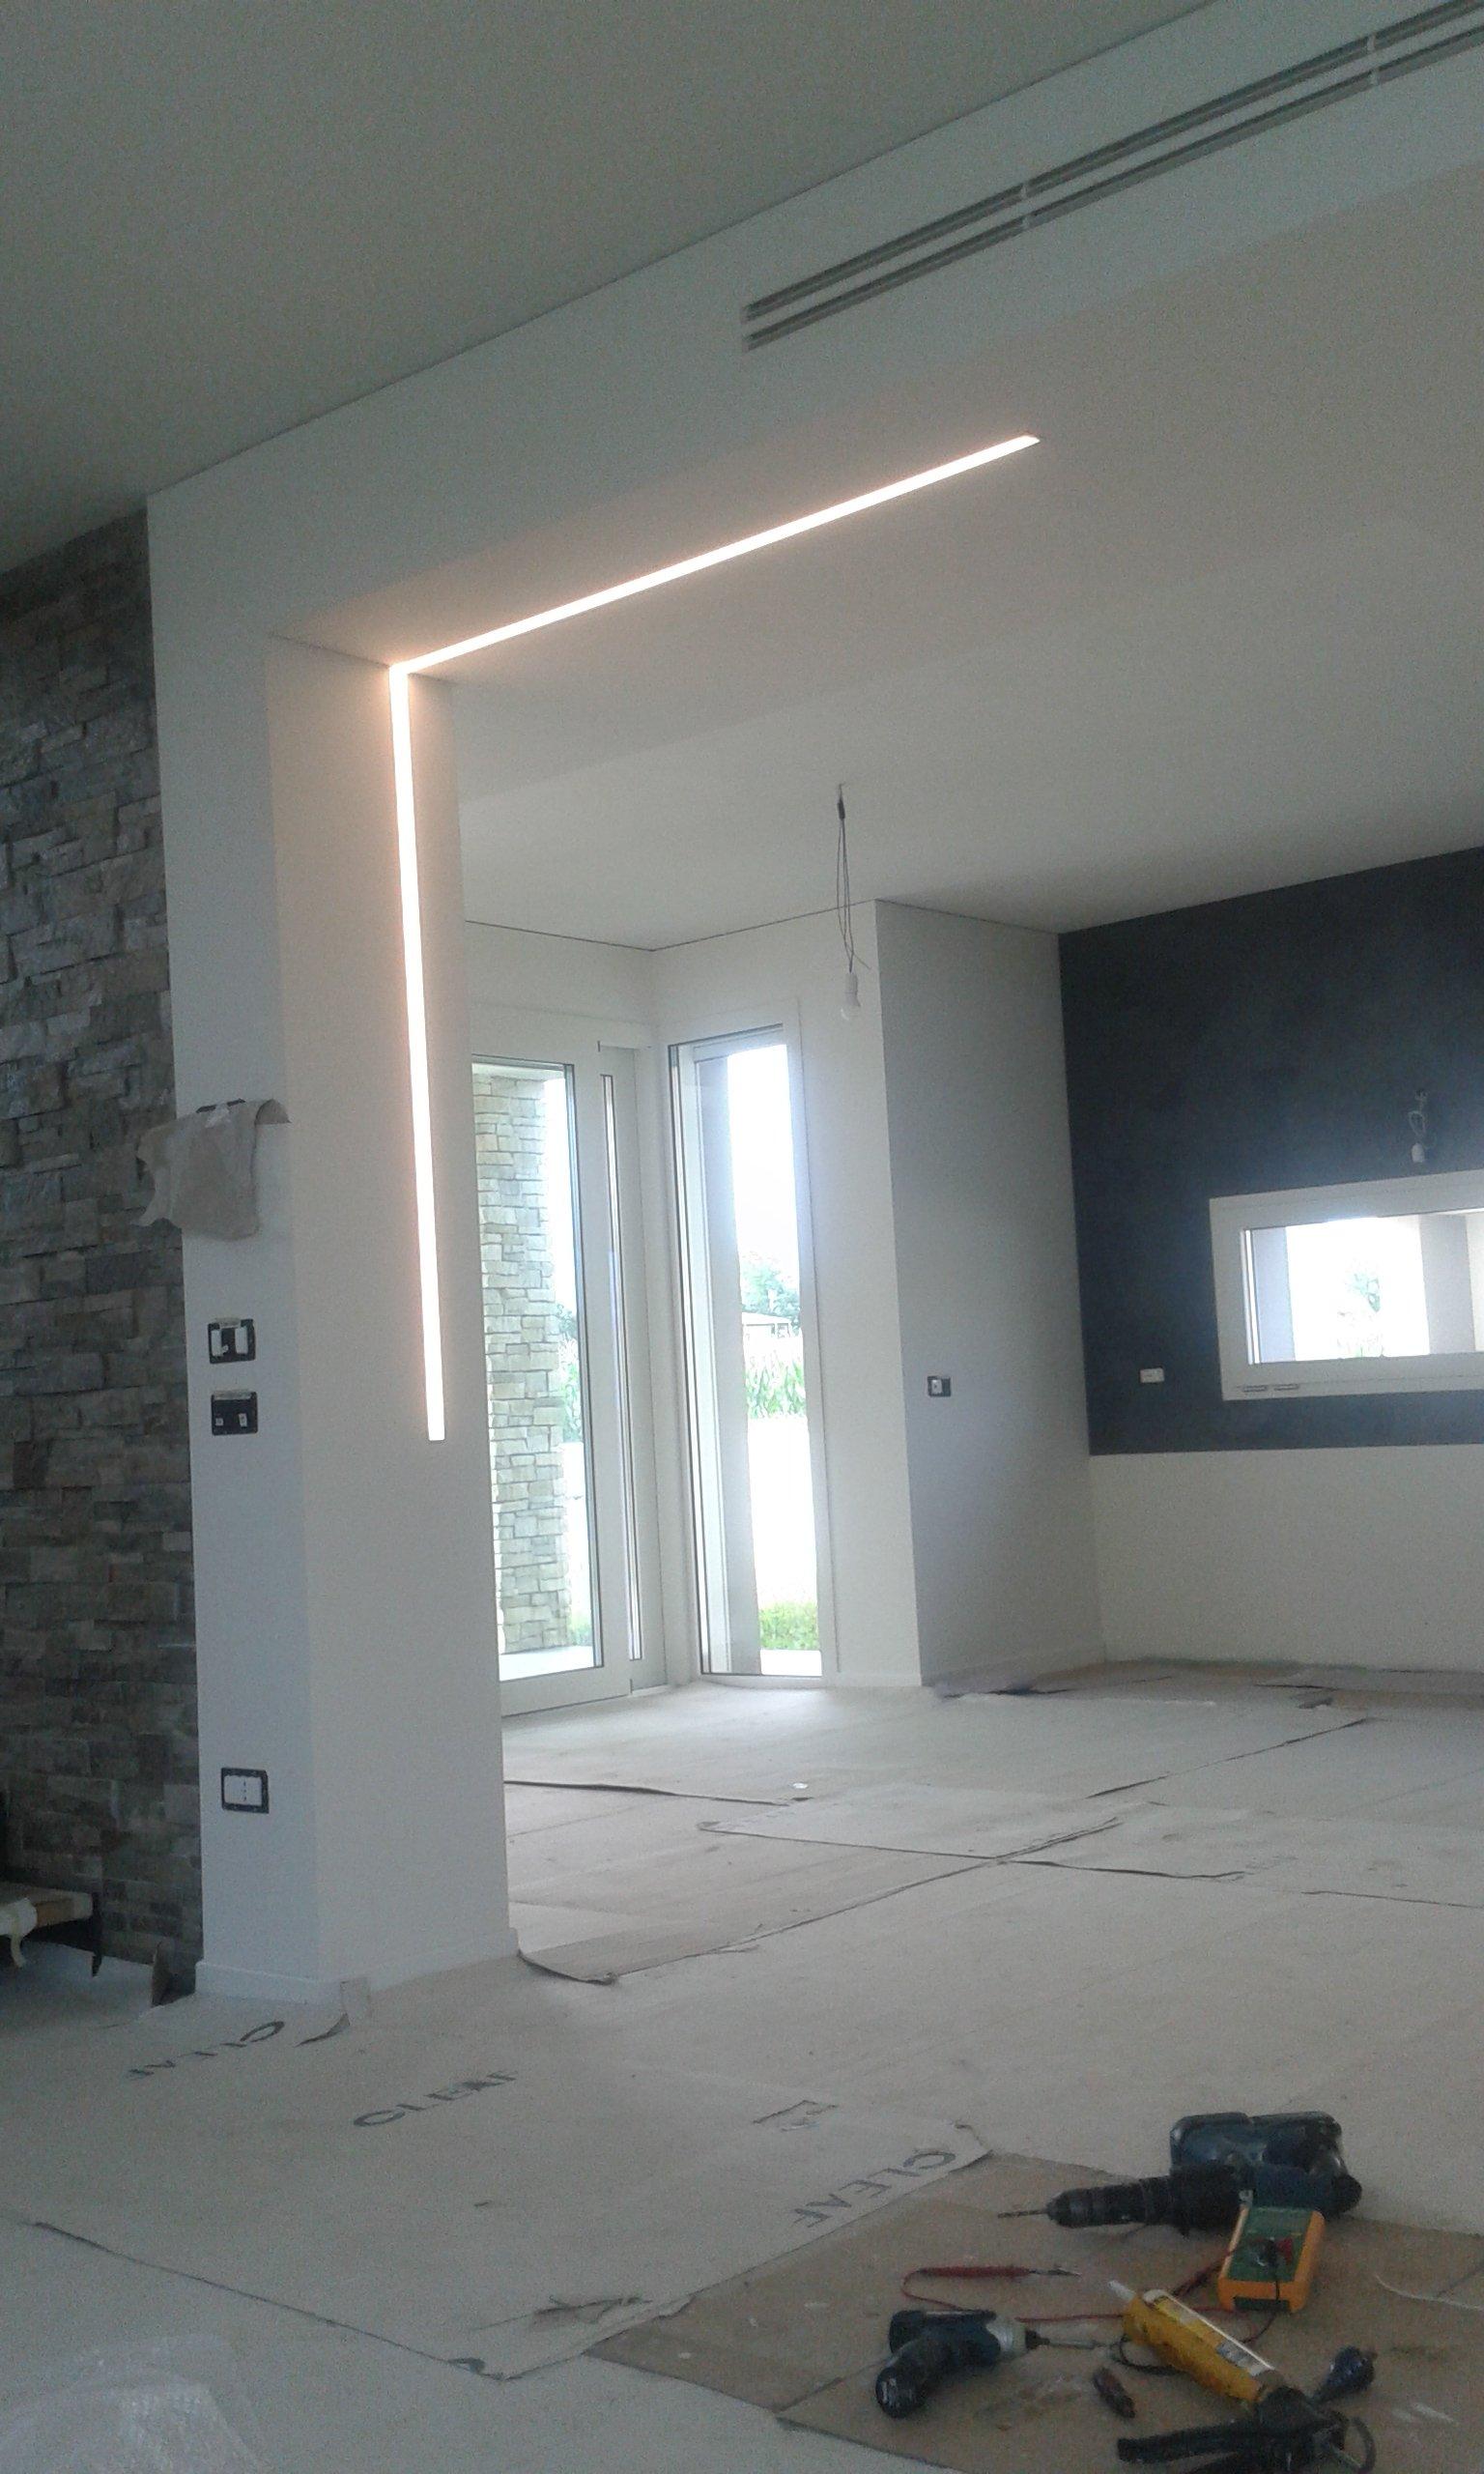 illuminazione a led abitazione